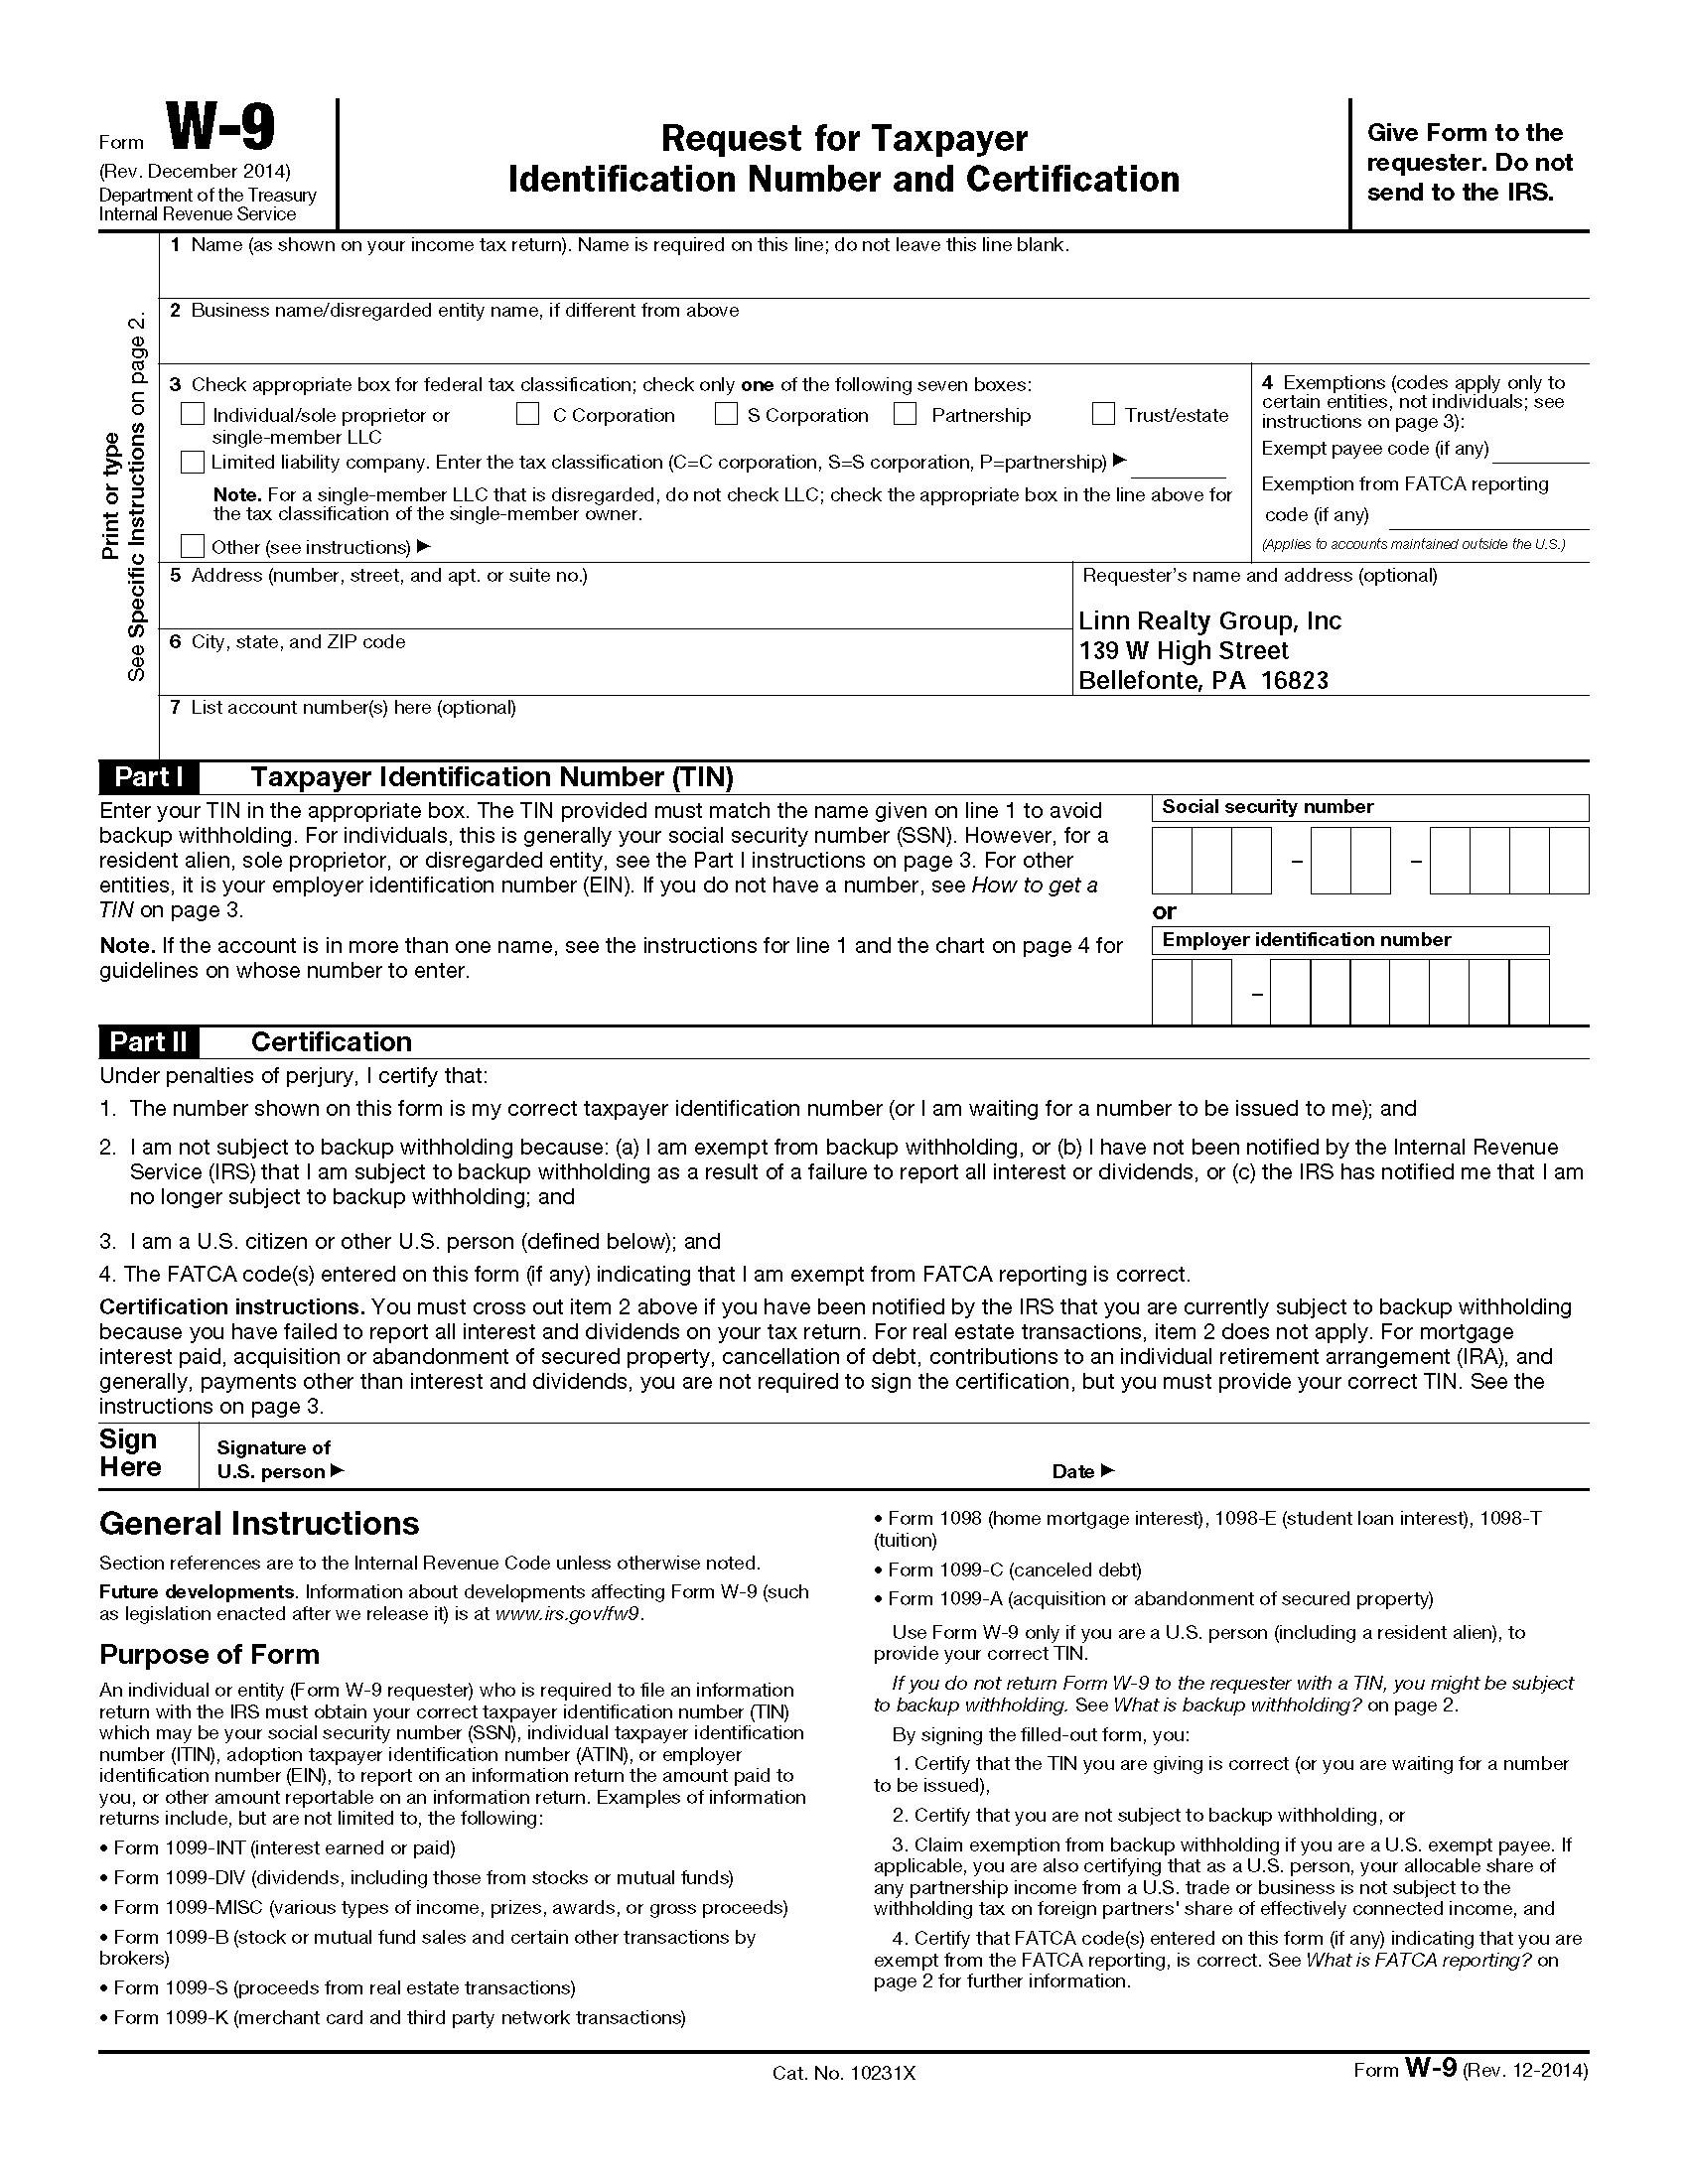 Blank W 9 Forms Printable 2020 Irs | Calendar Template Printable-2020 W9 Blank Tax Form